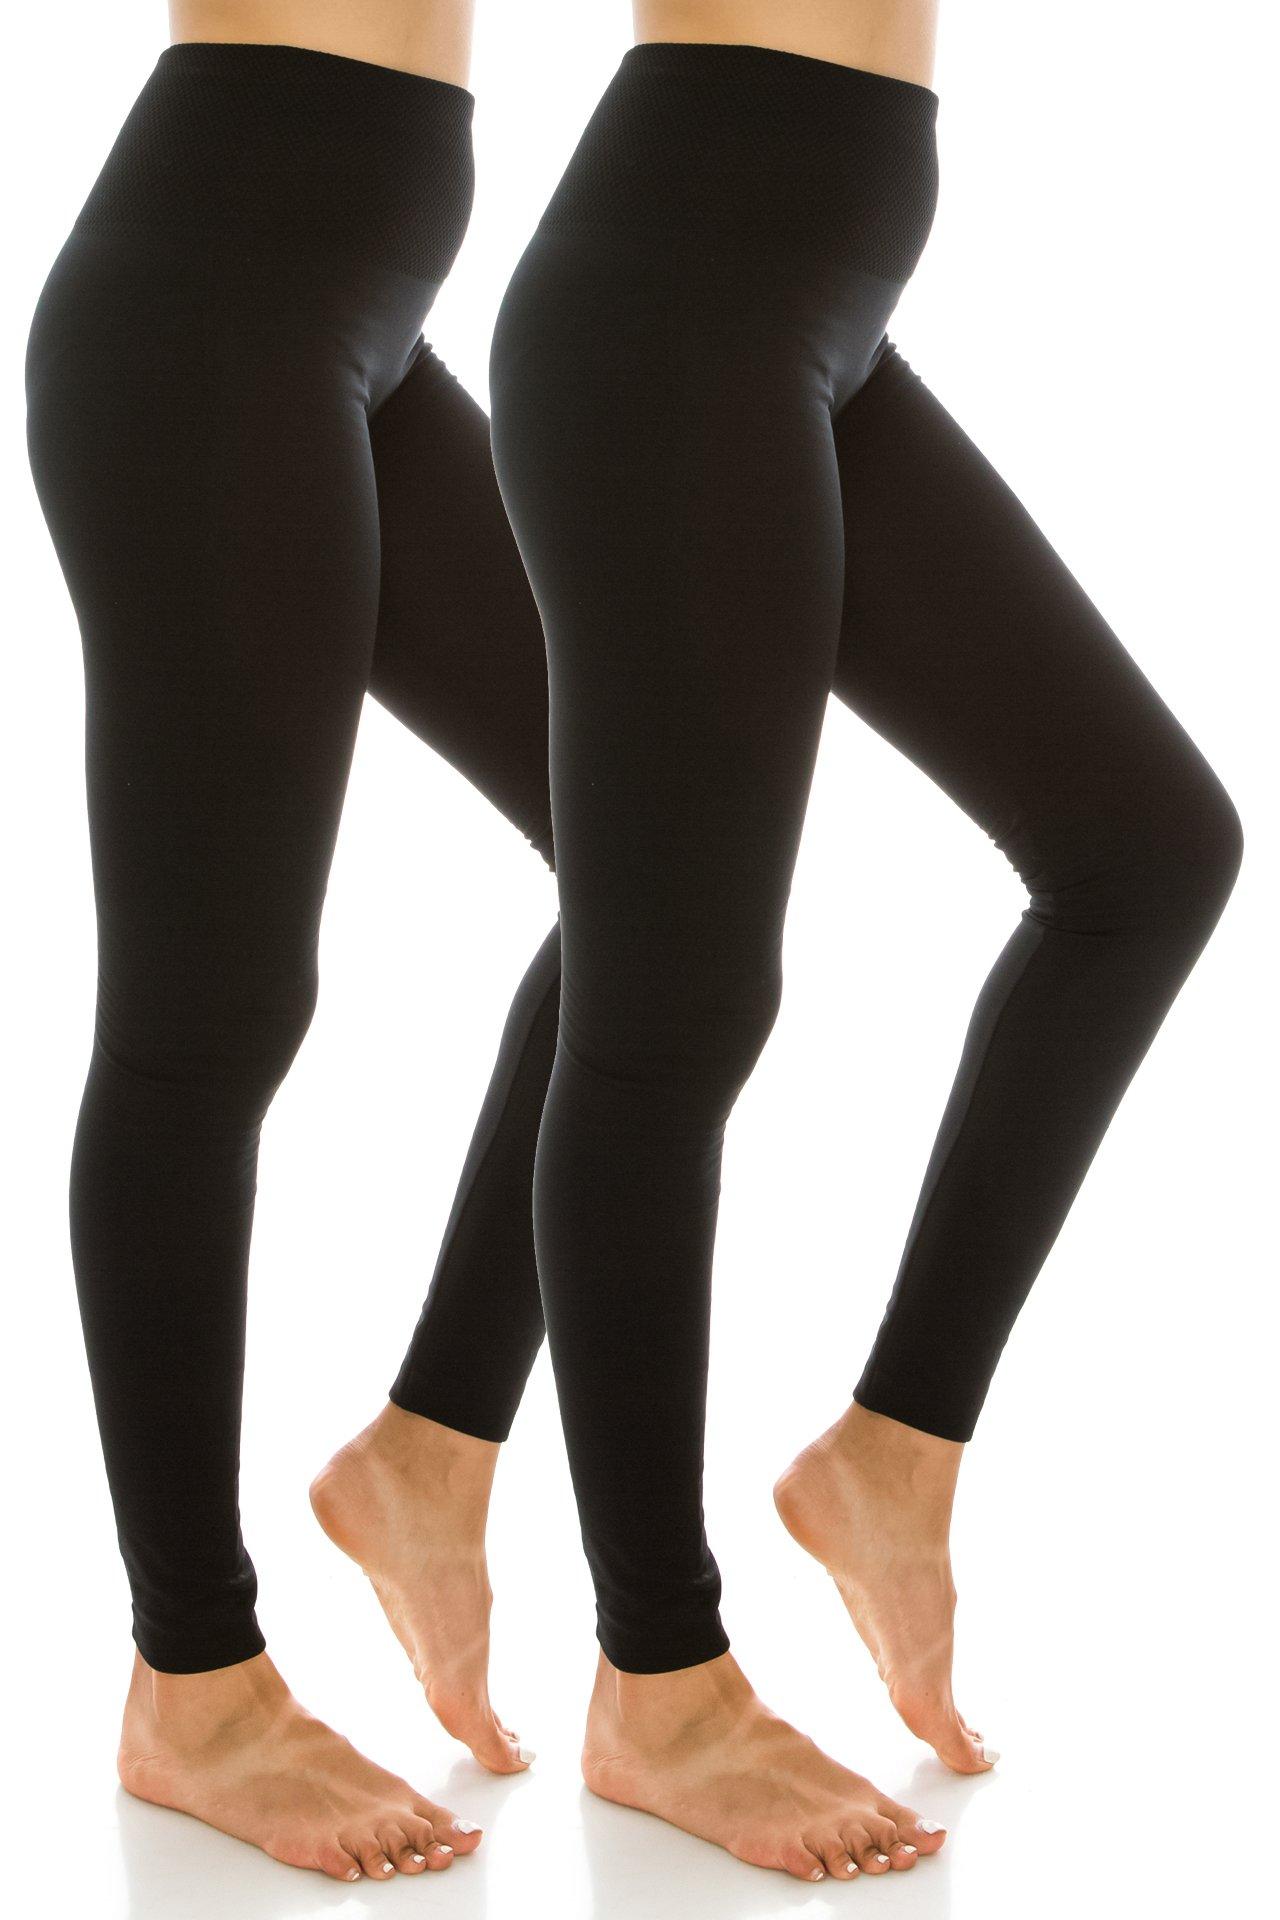 High Waist Fleece Lined Leggings for Women Sport high Waist 2PK Black Black OS